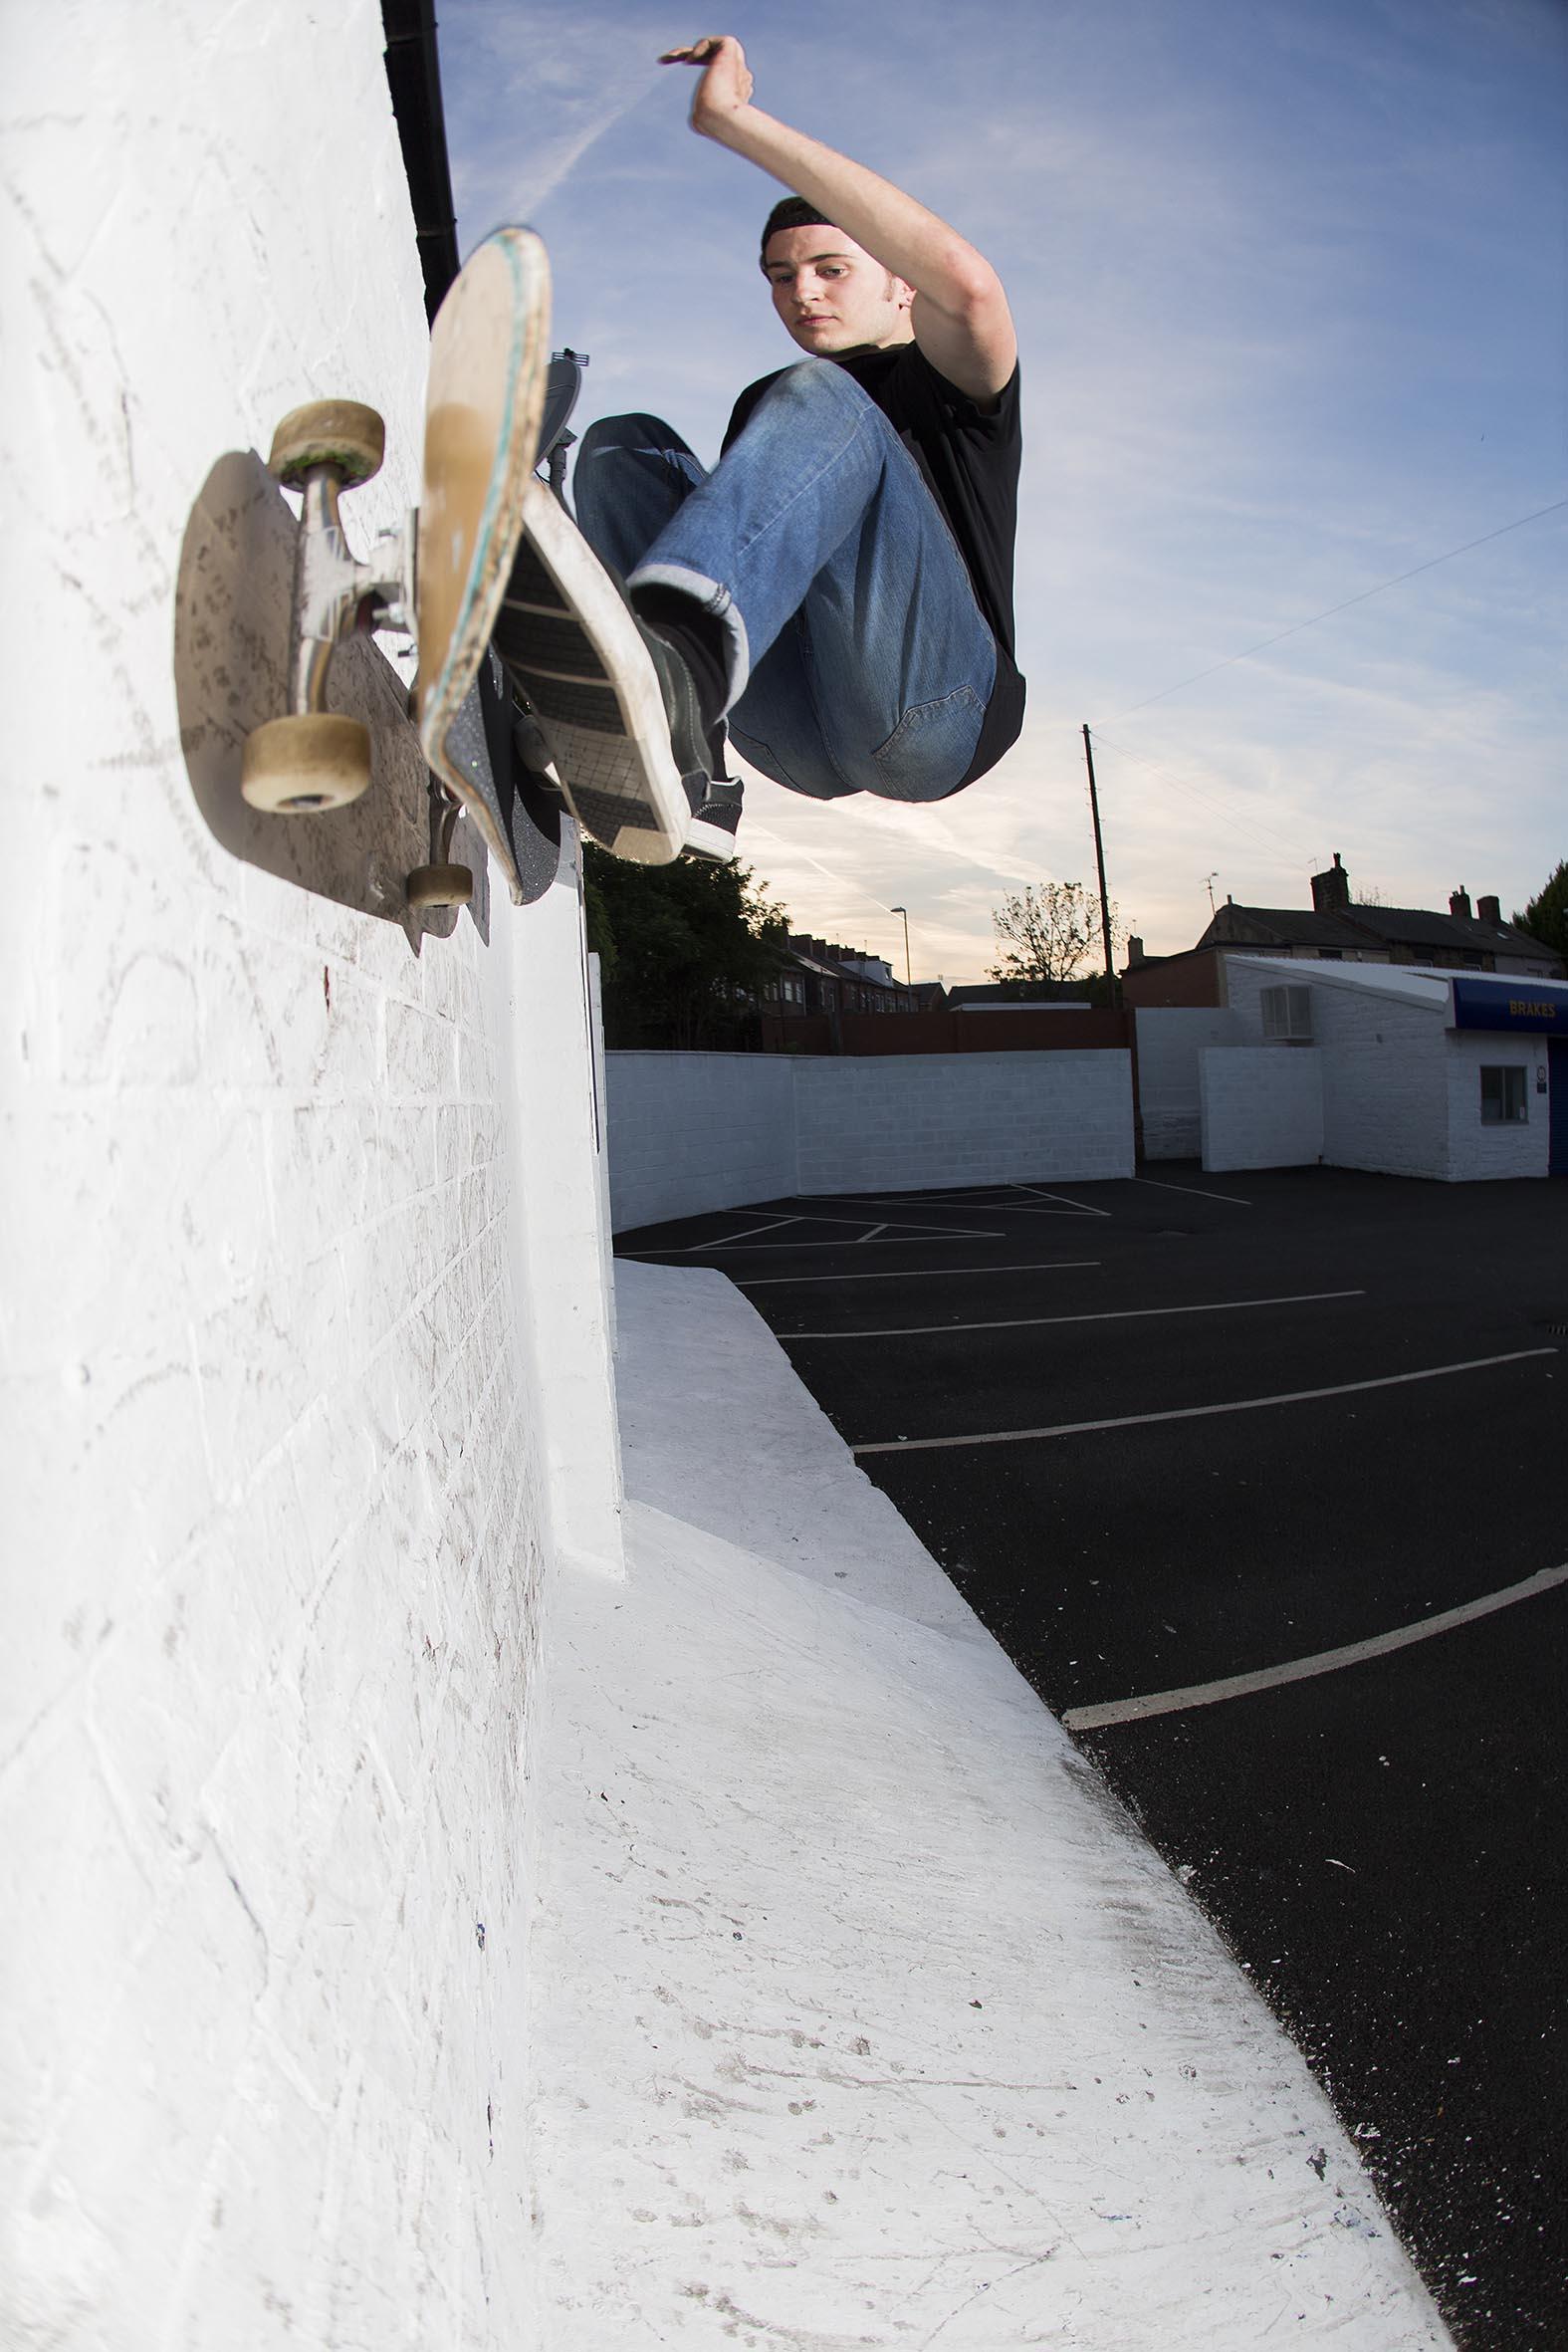 Myles Rushforth - frontside wallride